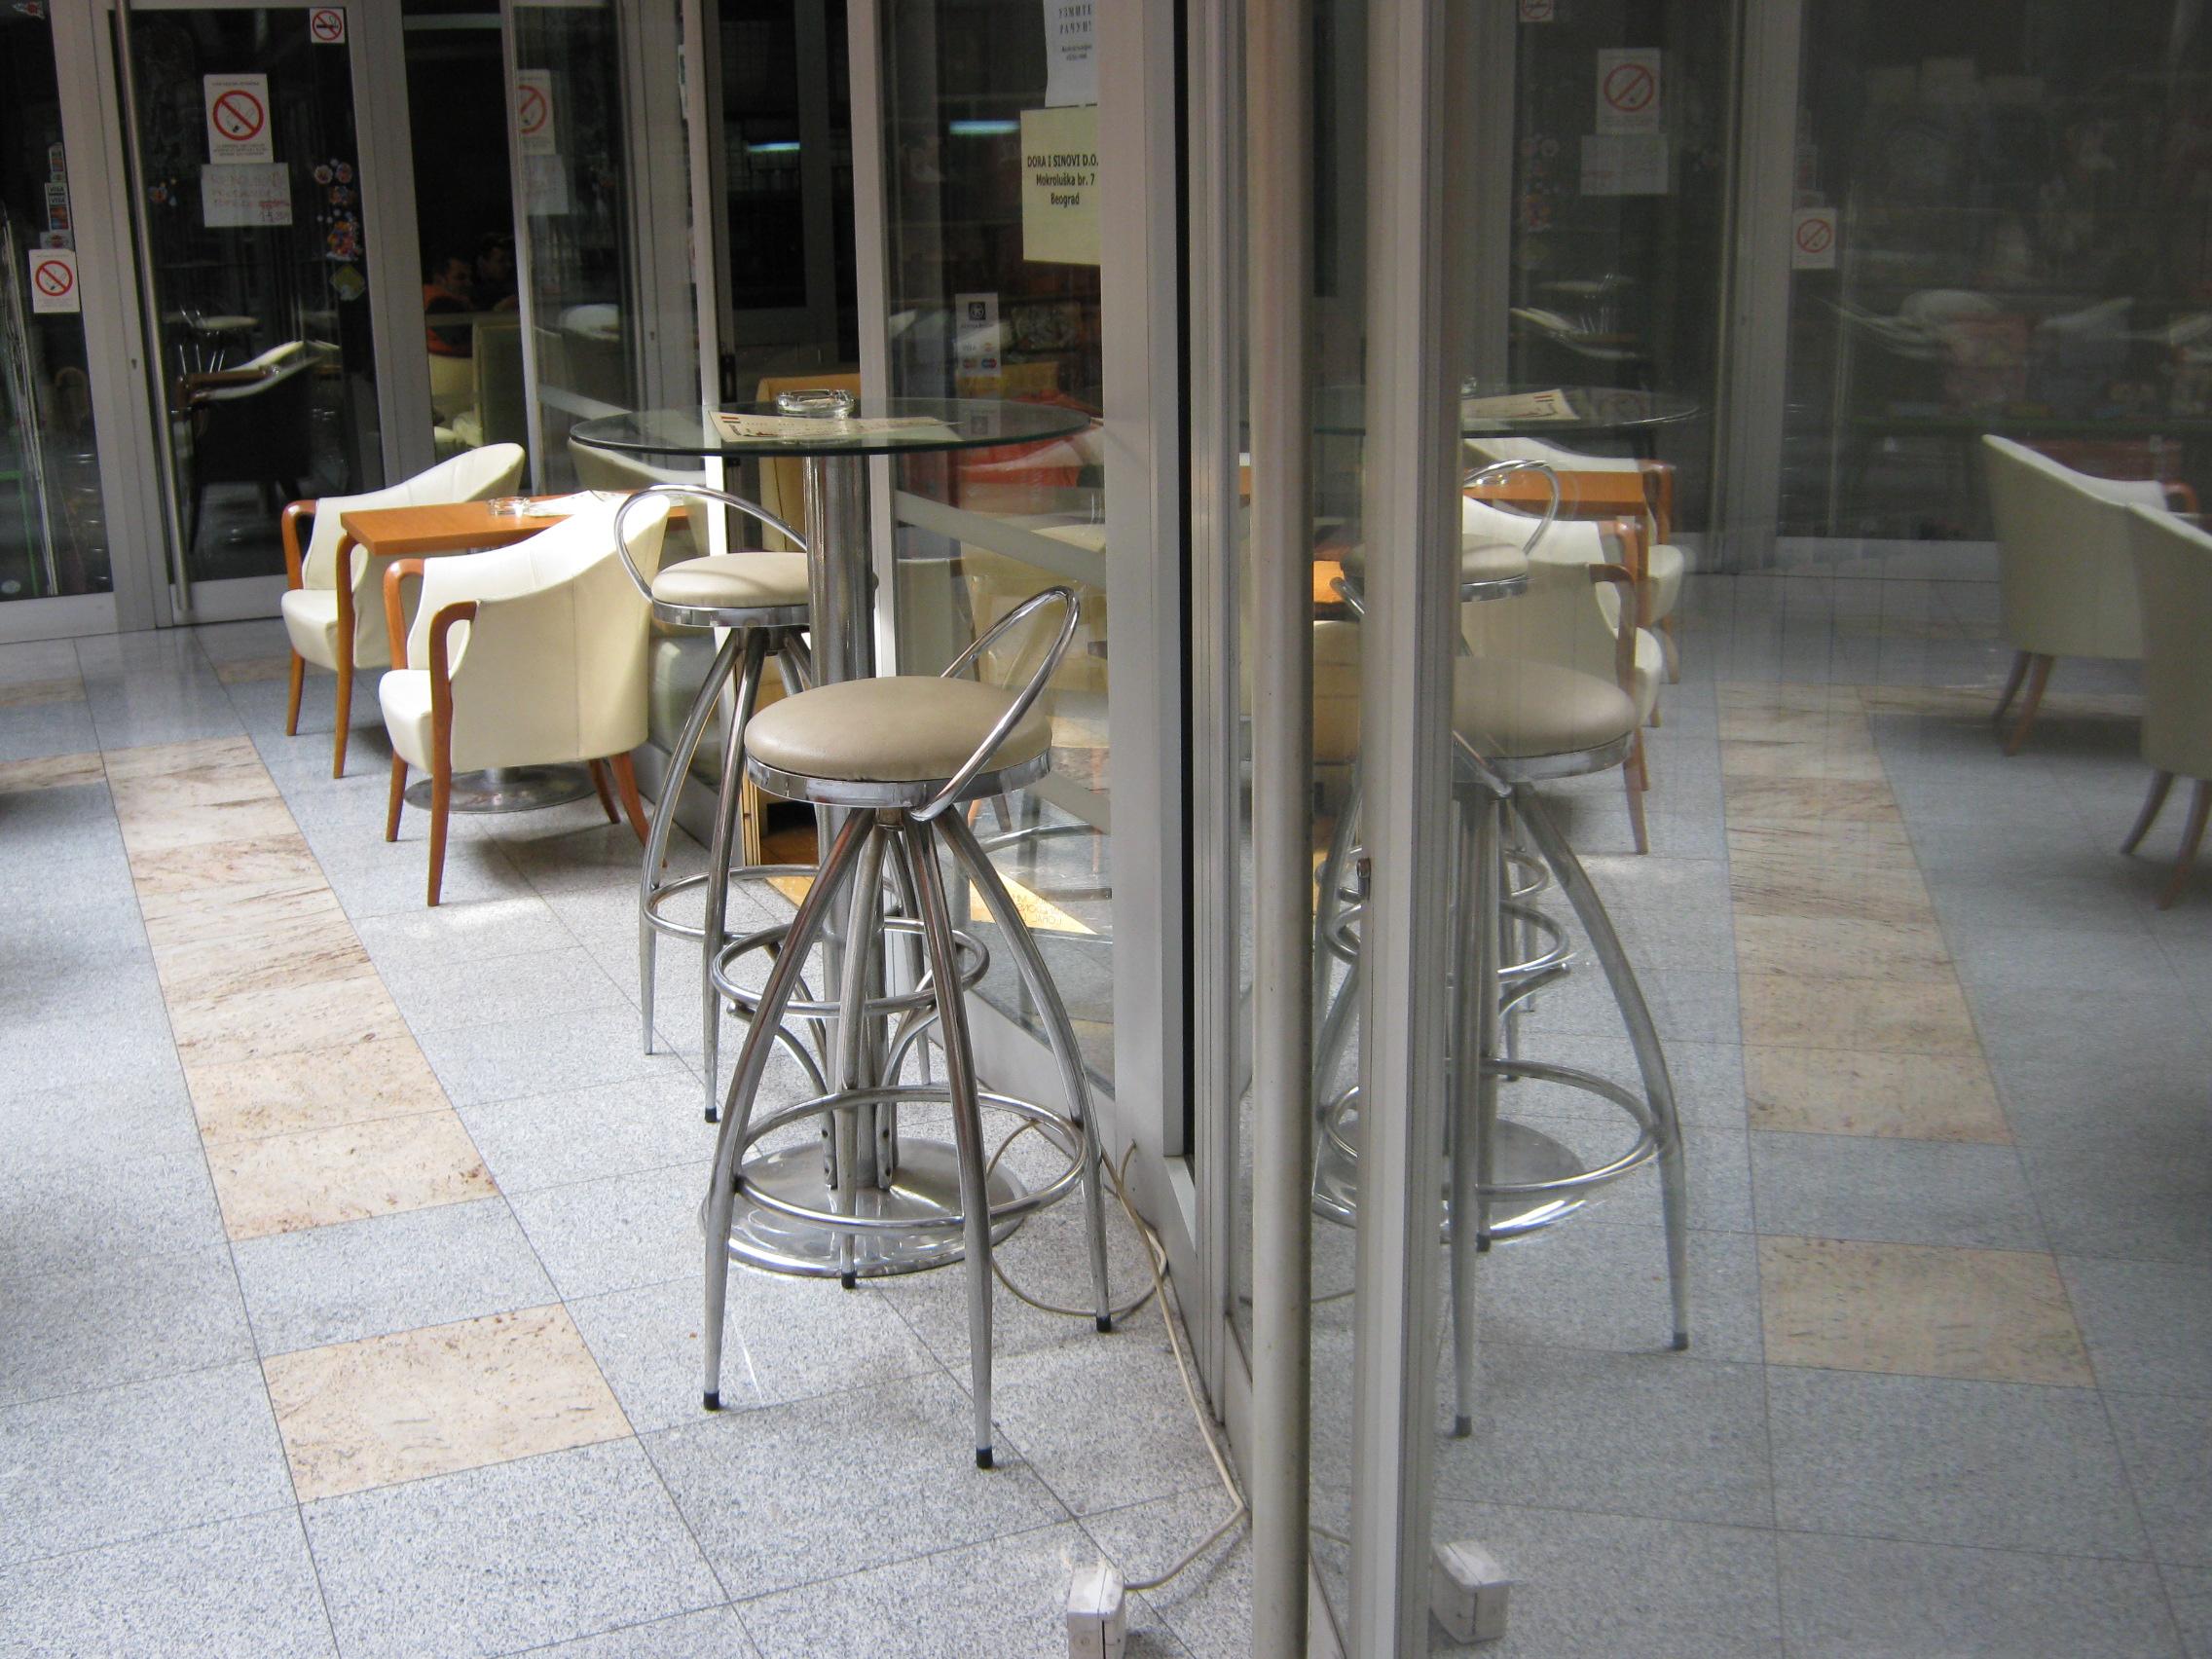 Kafe bar Little Italy